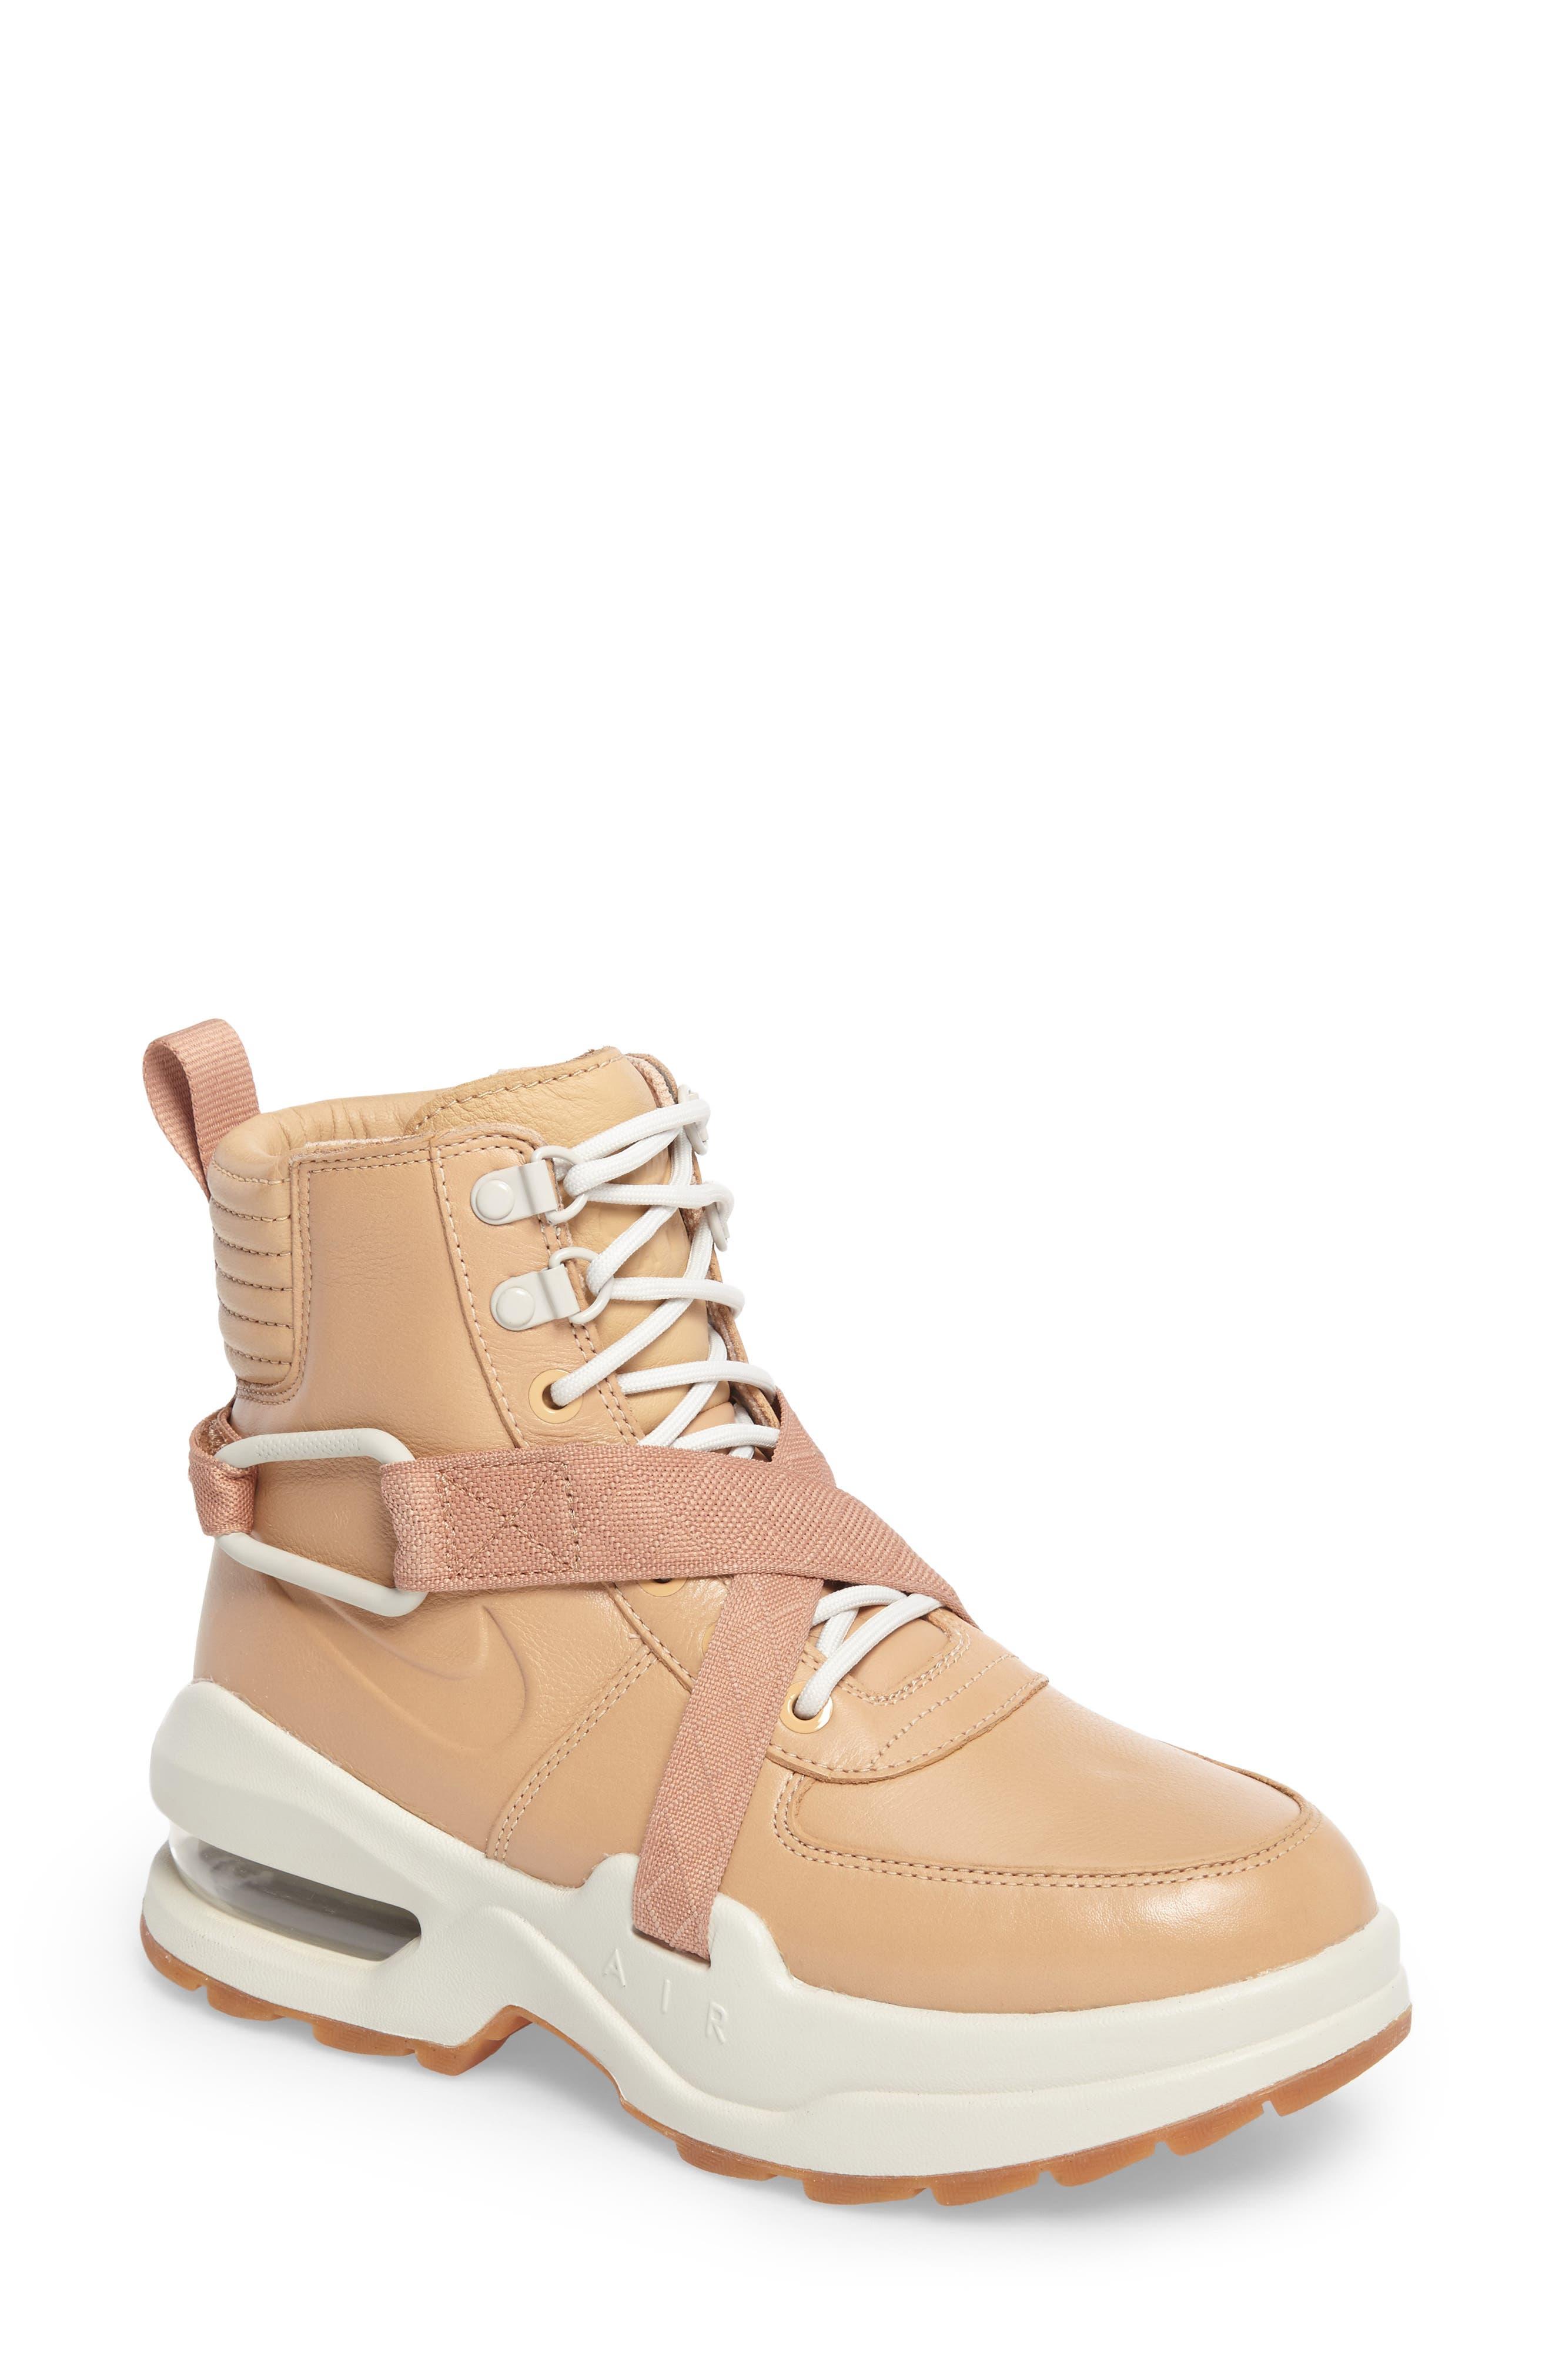 Air Max Goadome Sneaker Boot,                         Main,                         color, Tan/ Tan/ Light Bone/ Clay